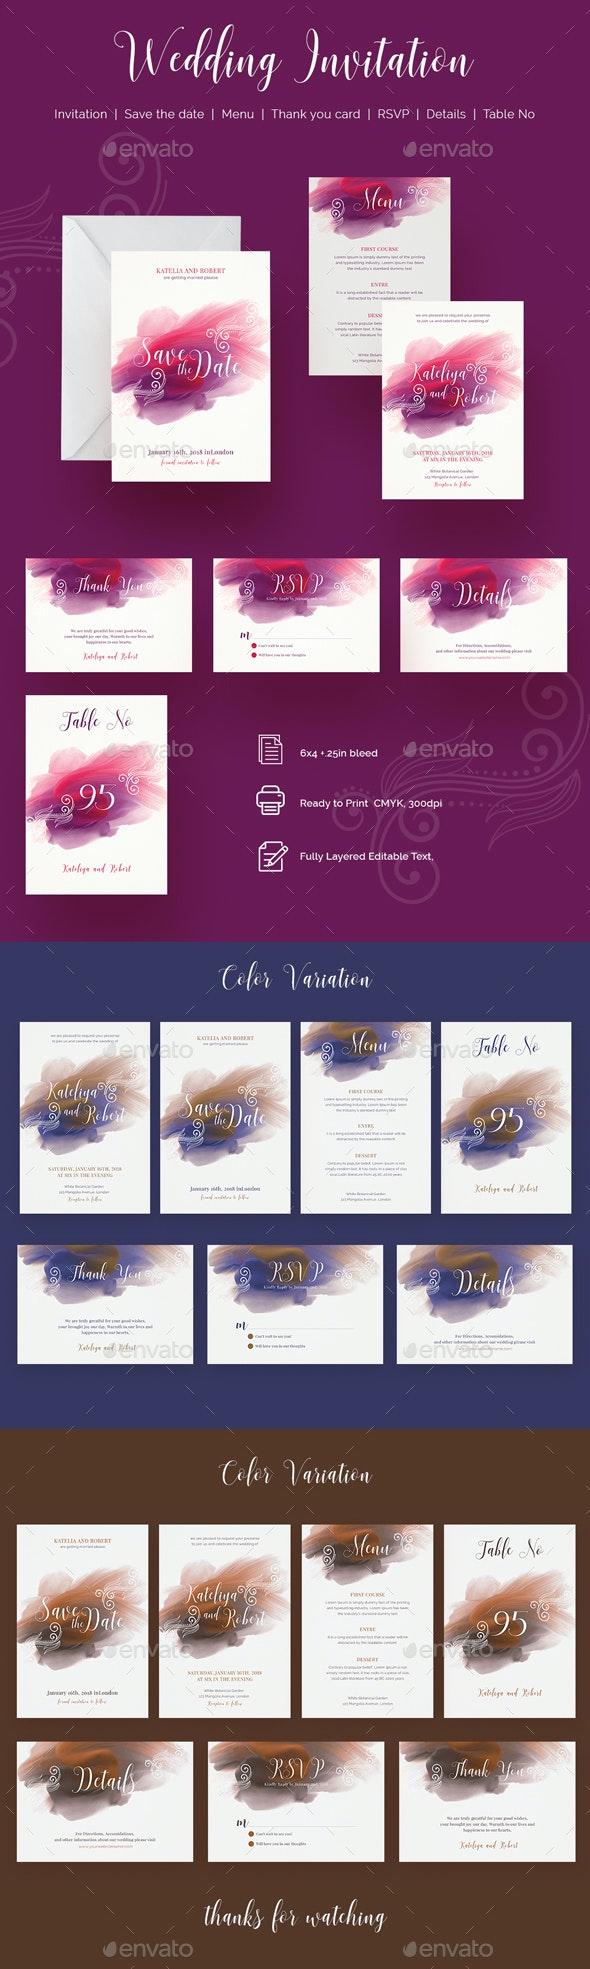 Wedding invitation - Print Templates